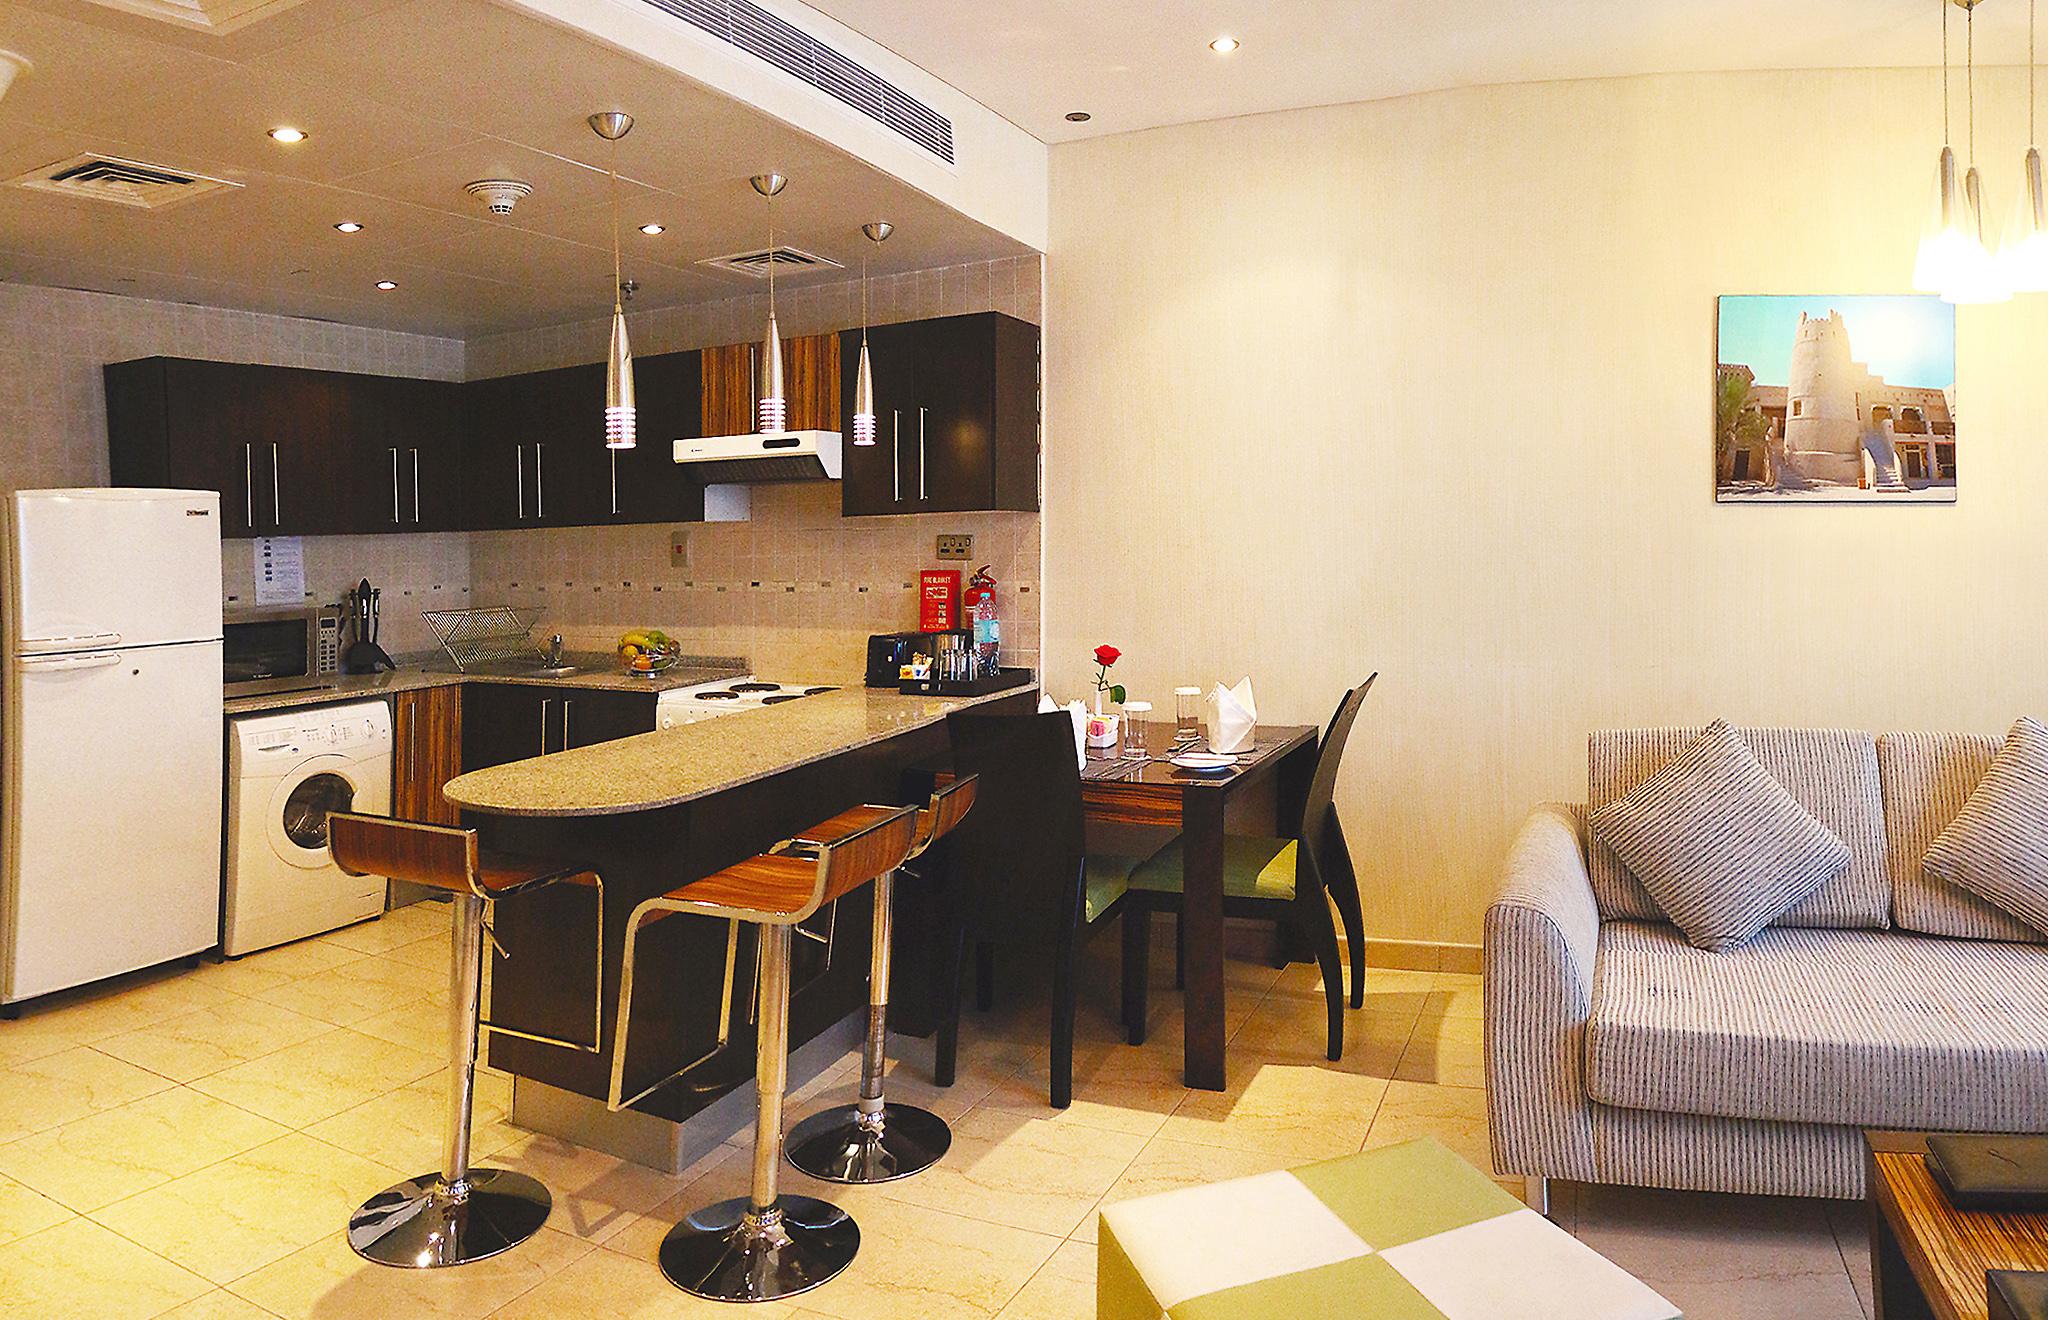 Image CPHA_1BR_Standard_Kitchen_Dining_Area.jpg